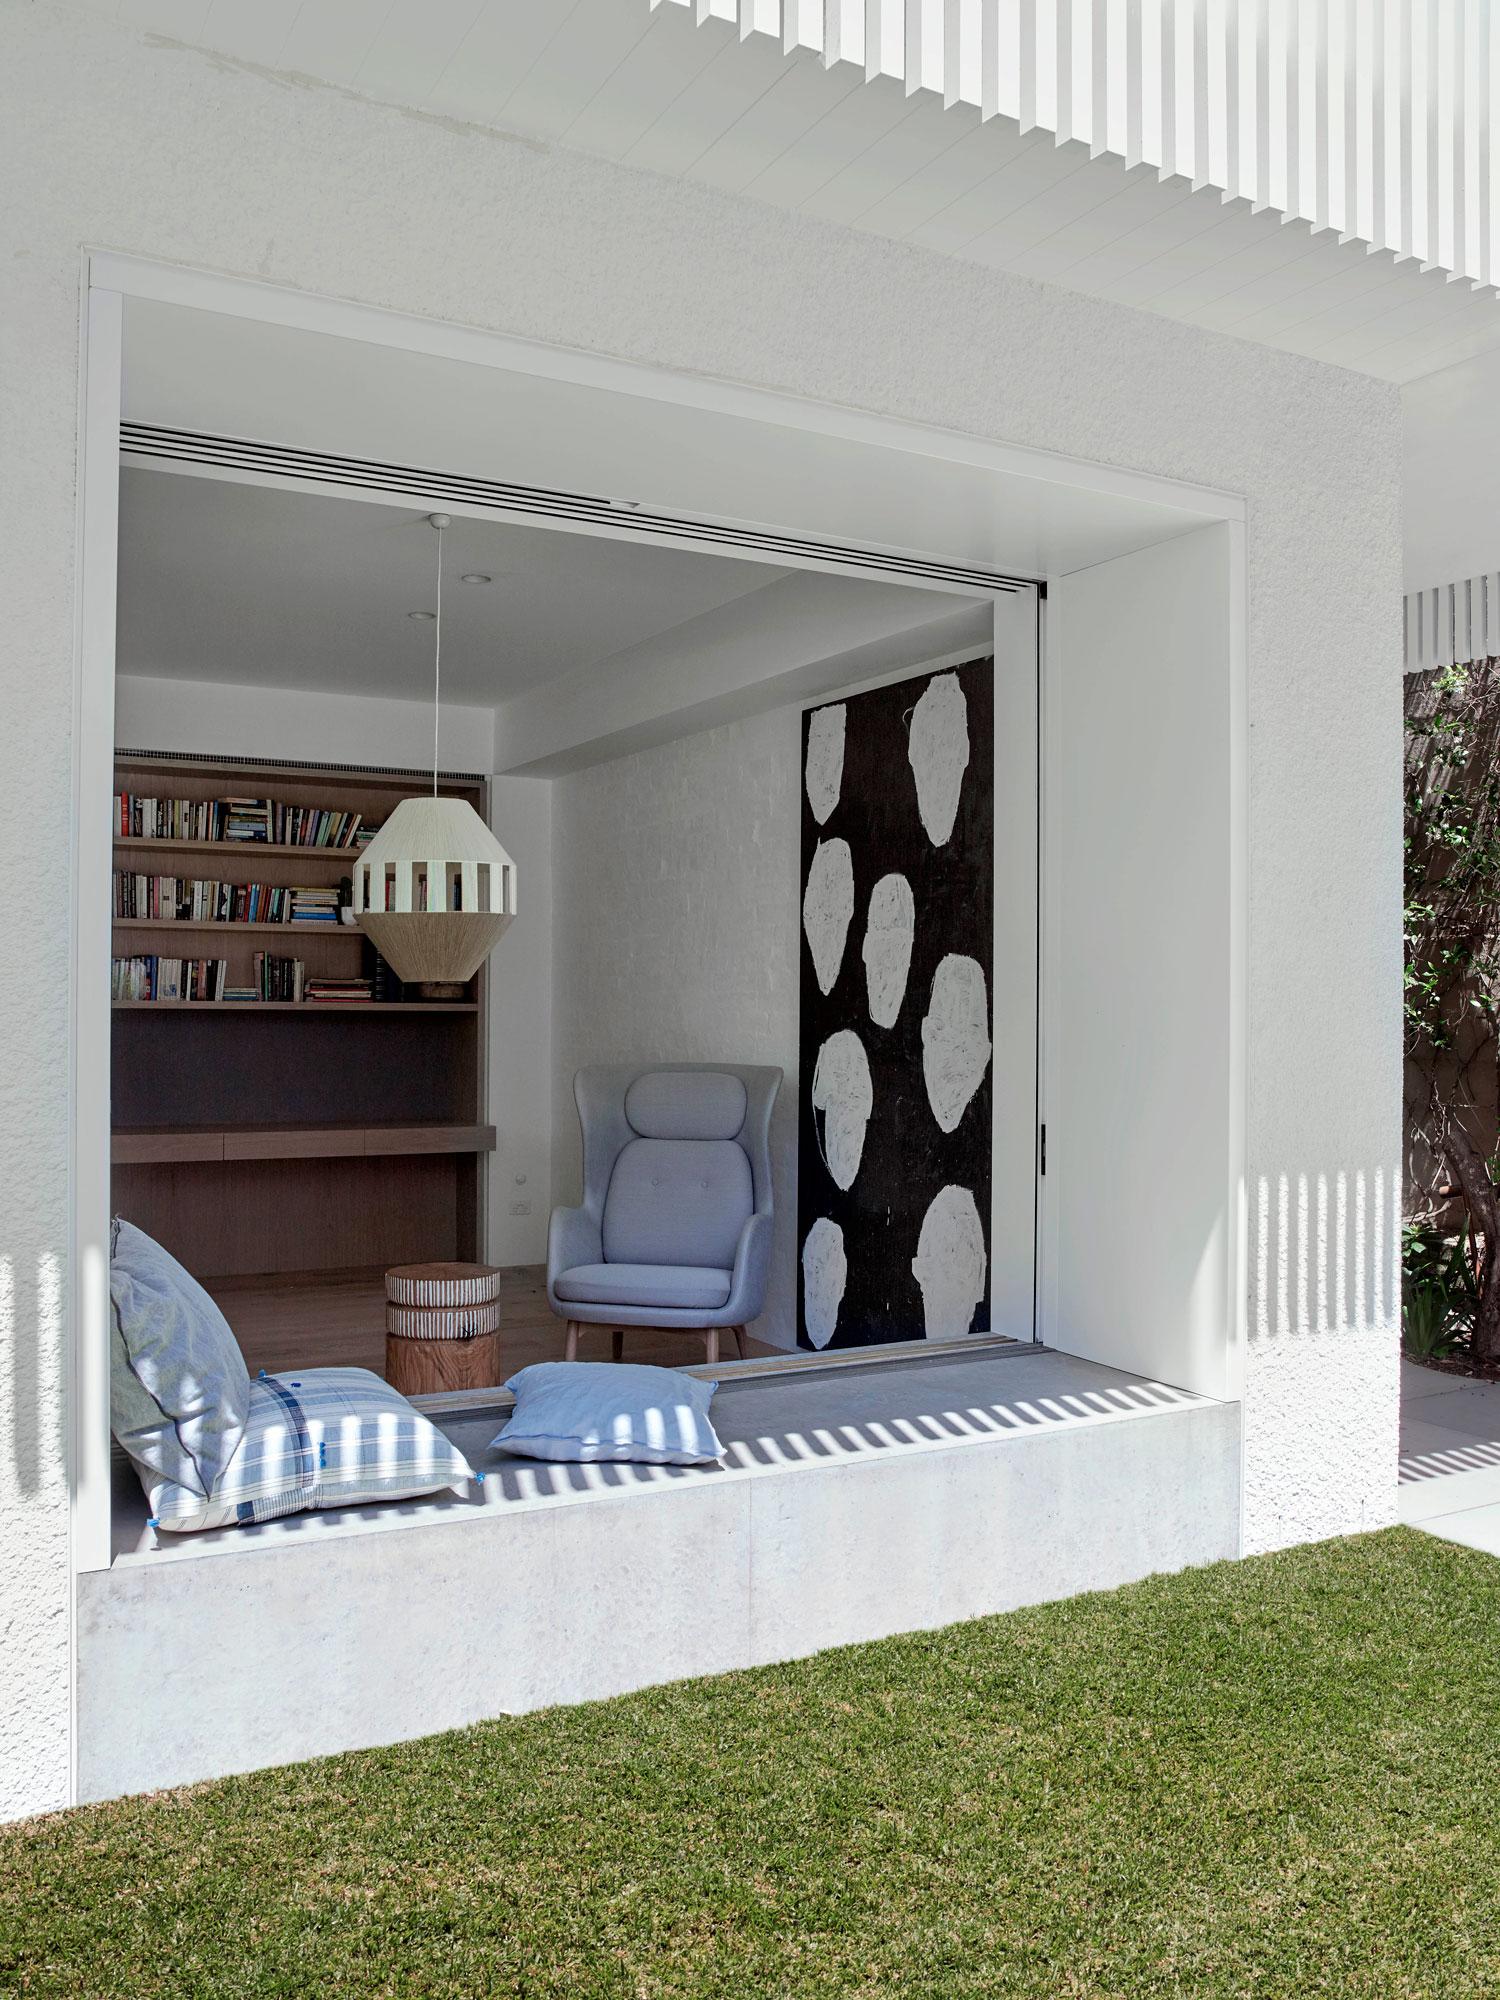 Clovelly House Sydney By Madeleine Blanchfield Architects